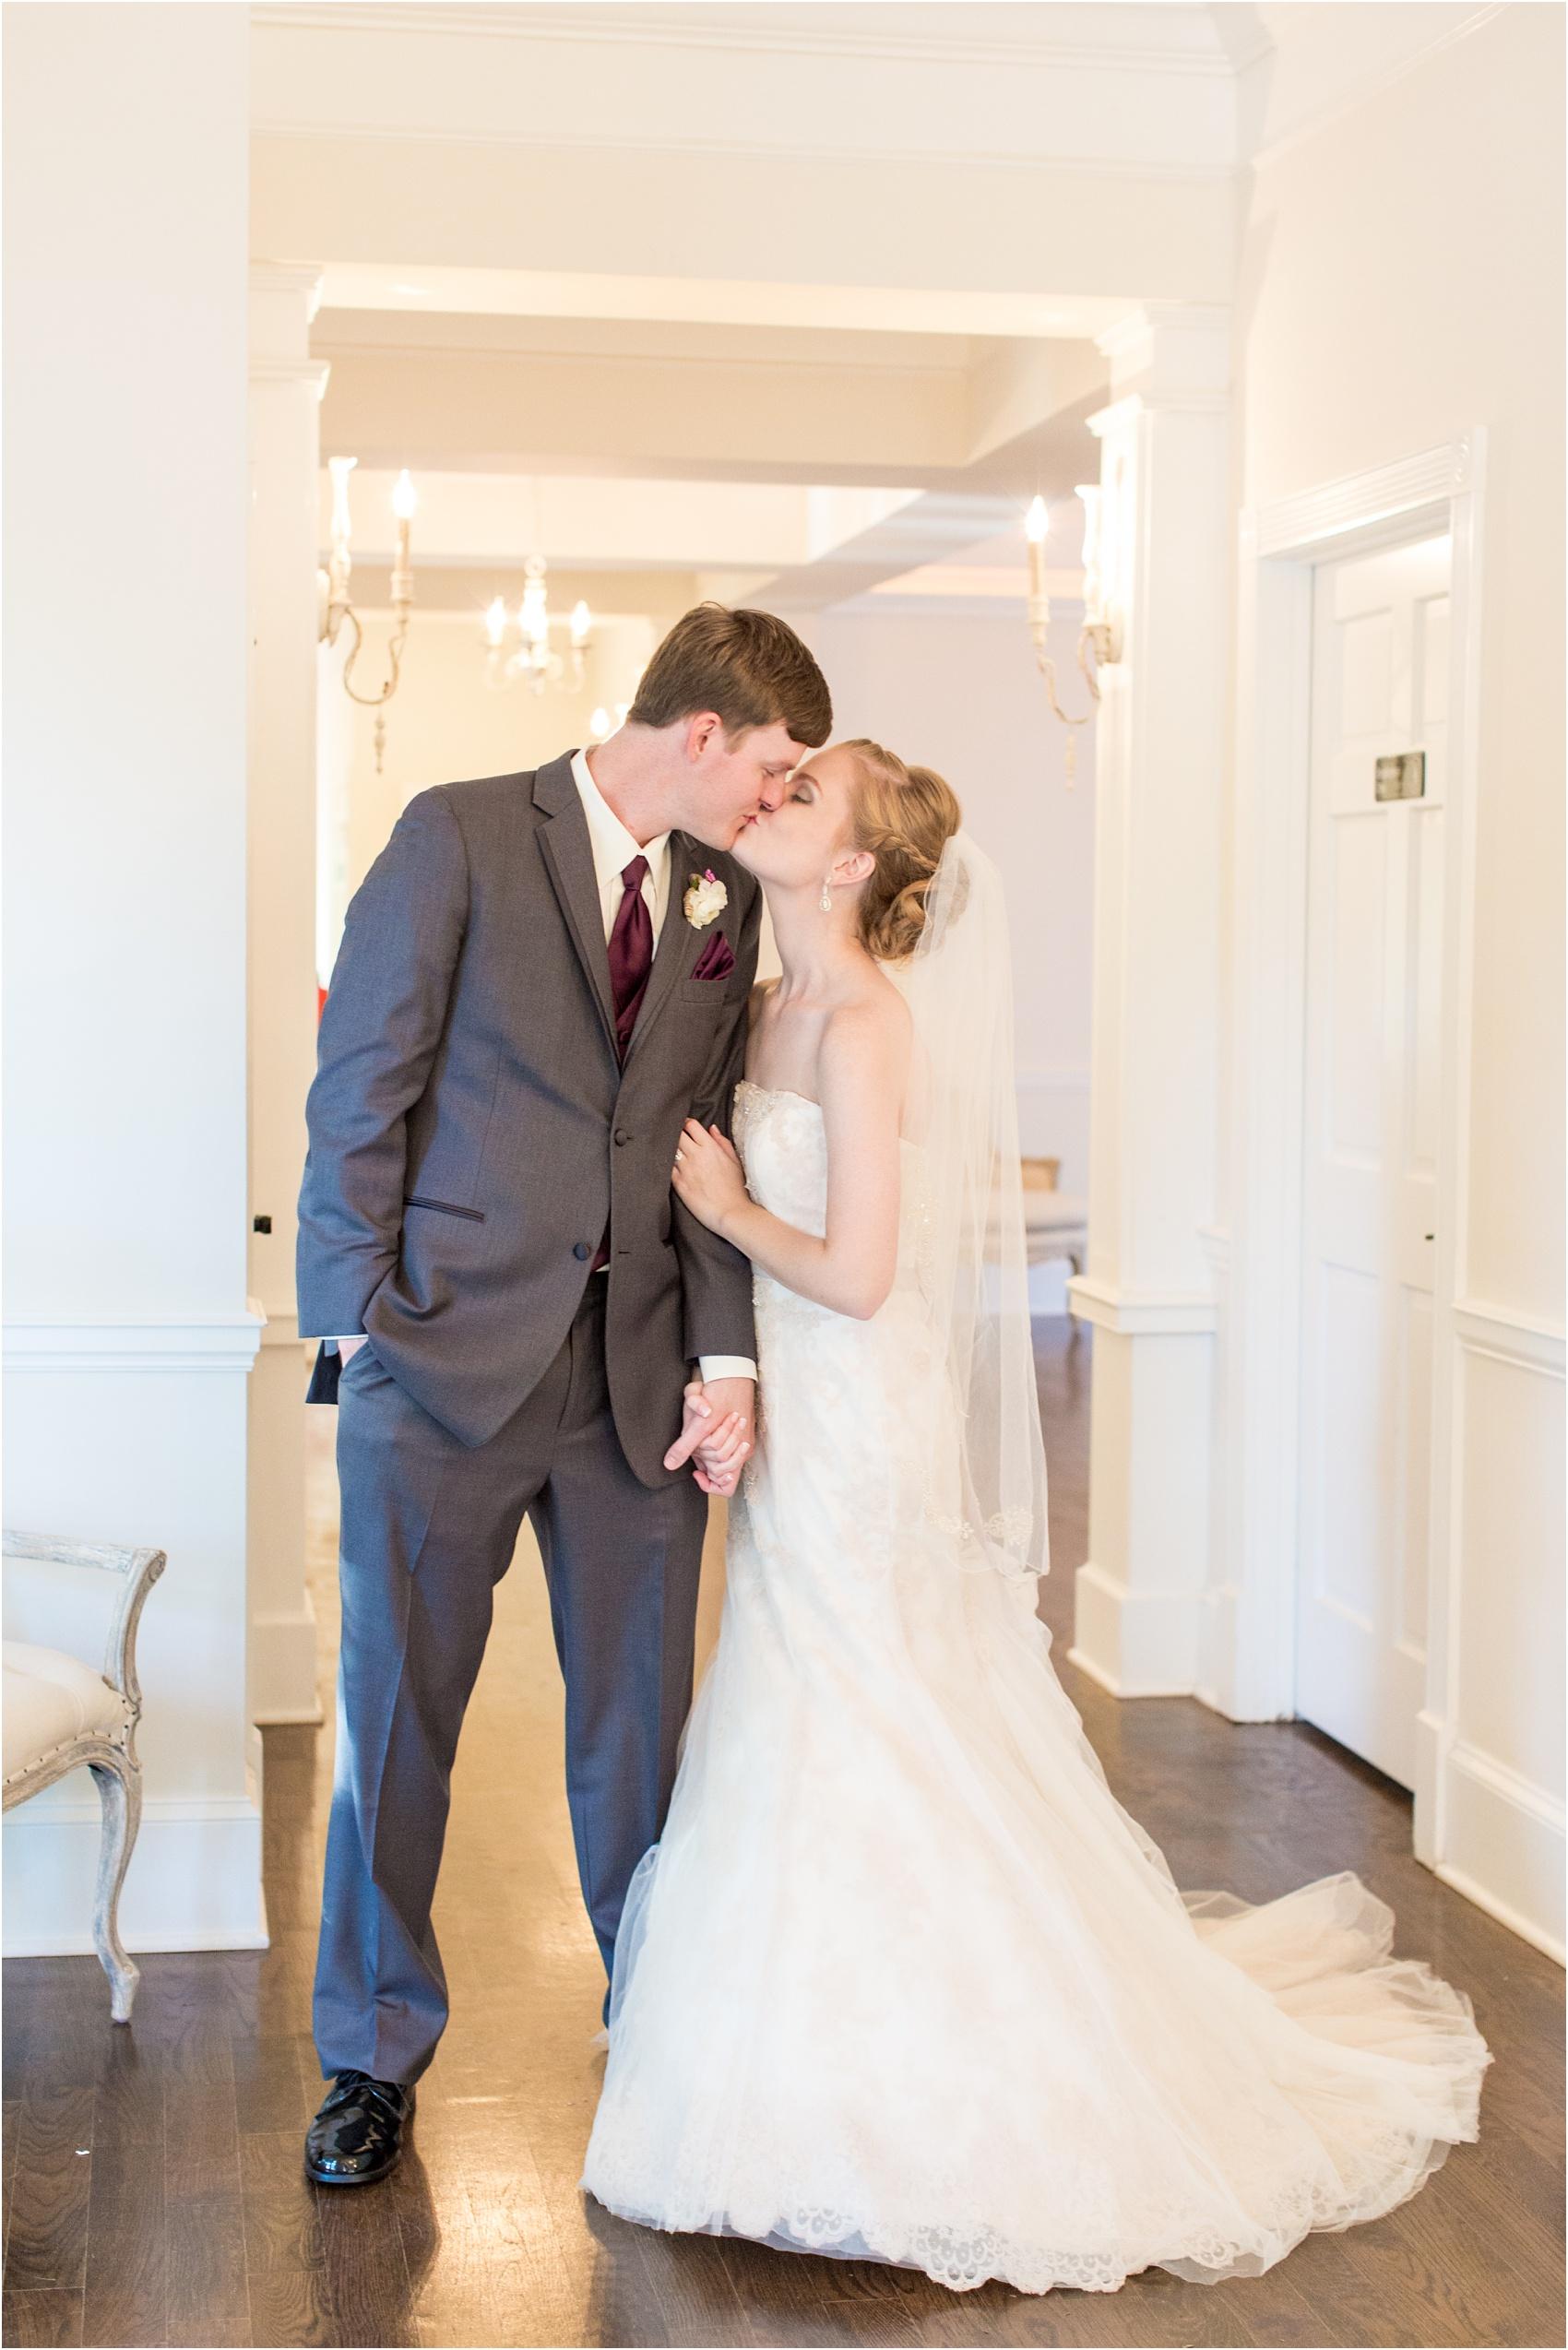 Savannah Eve Photography- Perkins Wedding- Blog-19.jpg